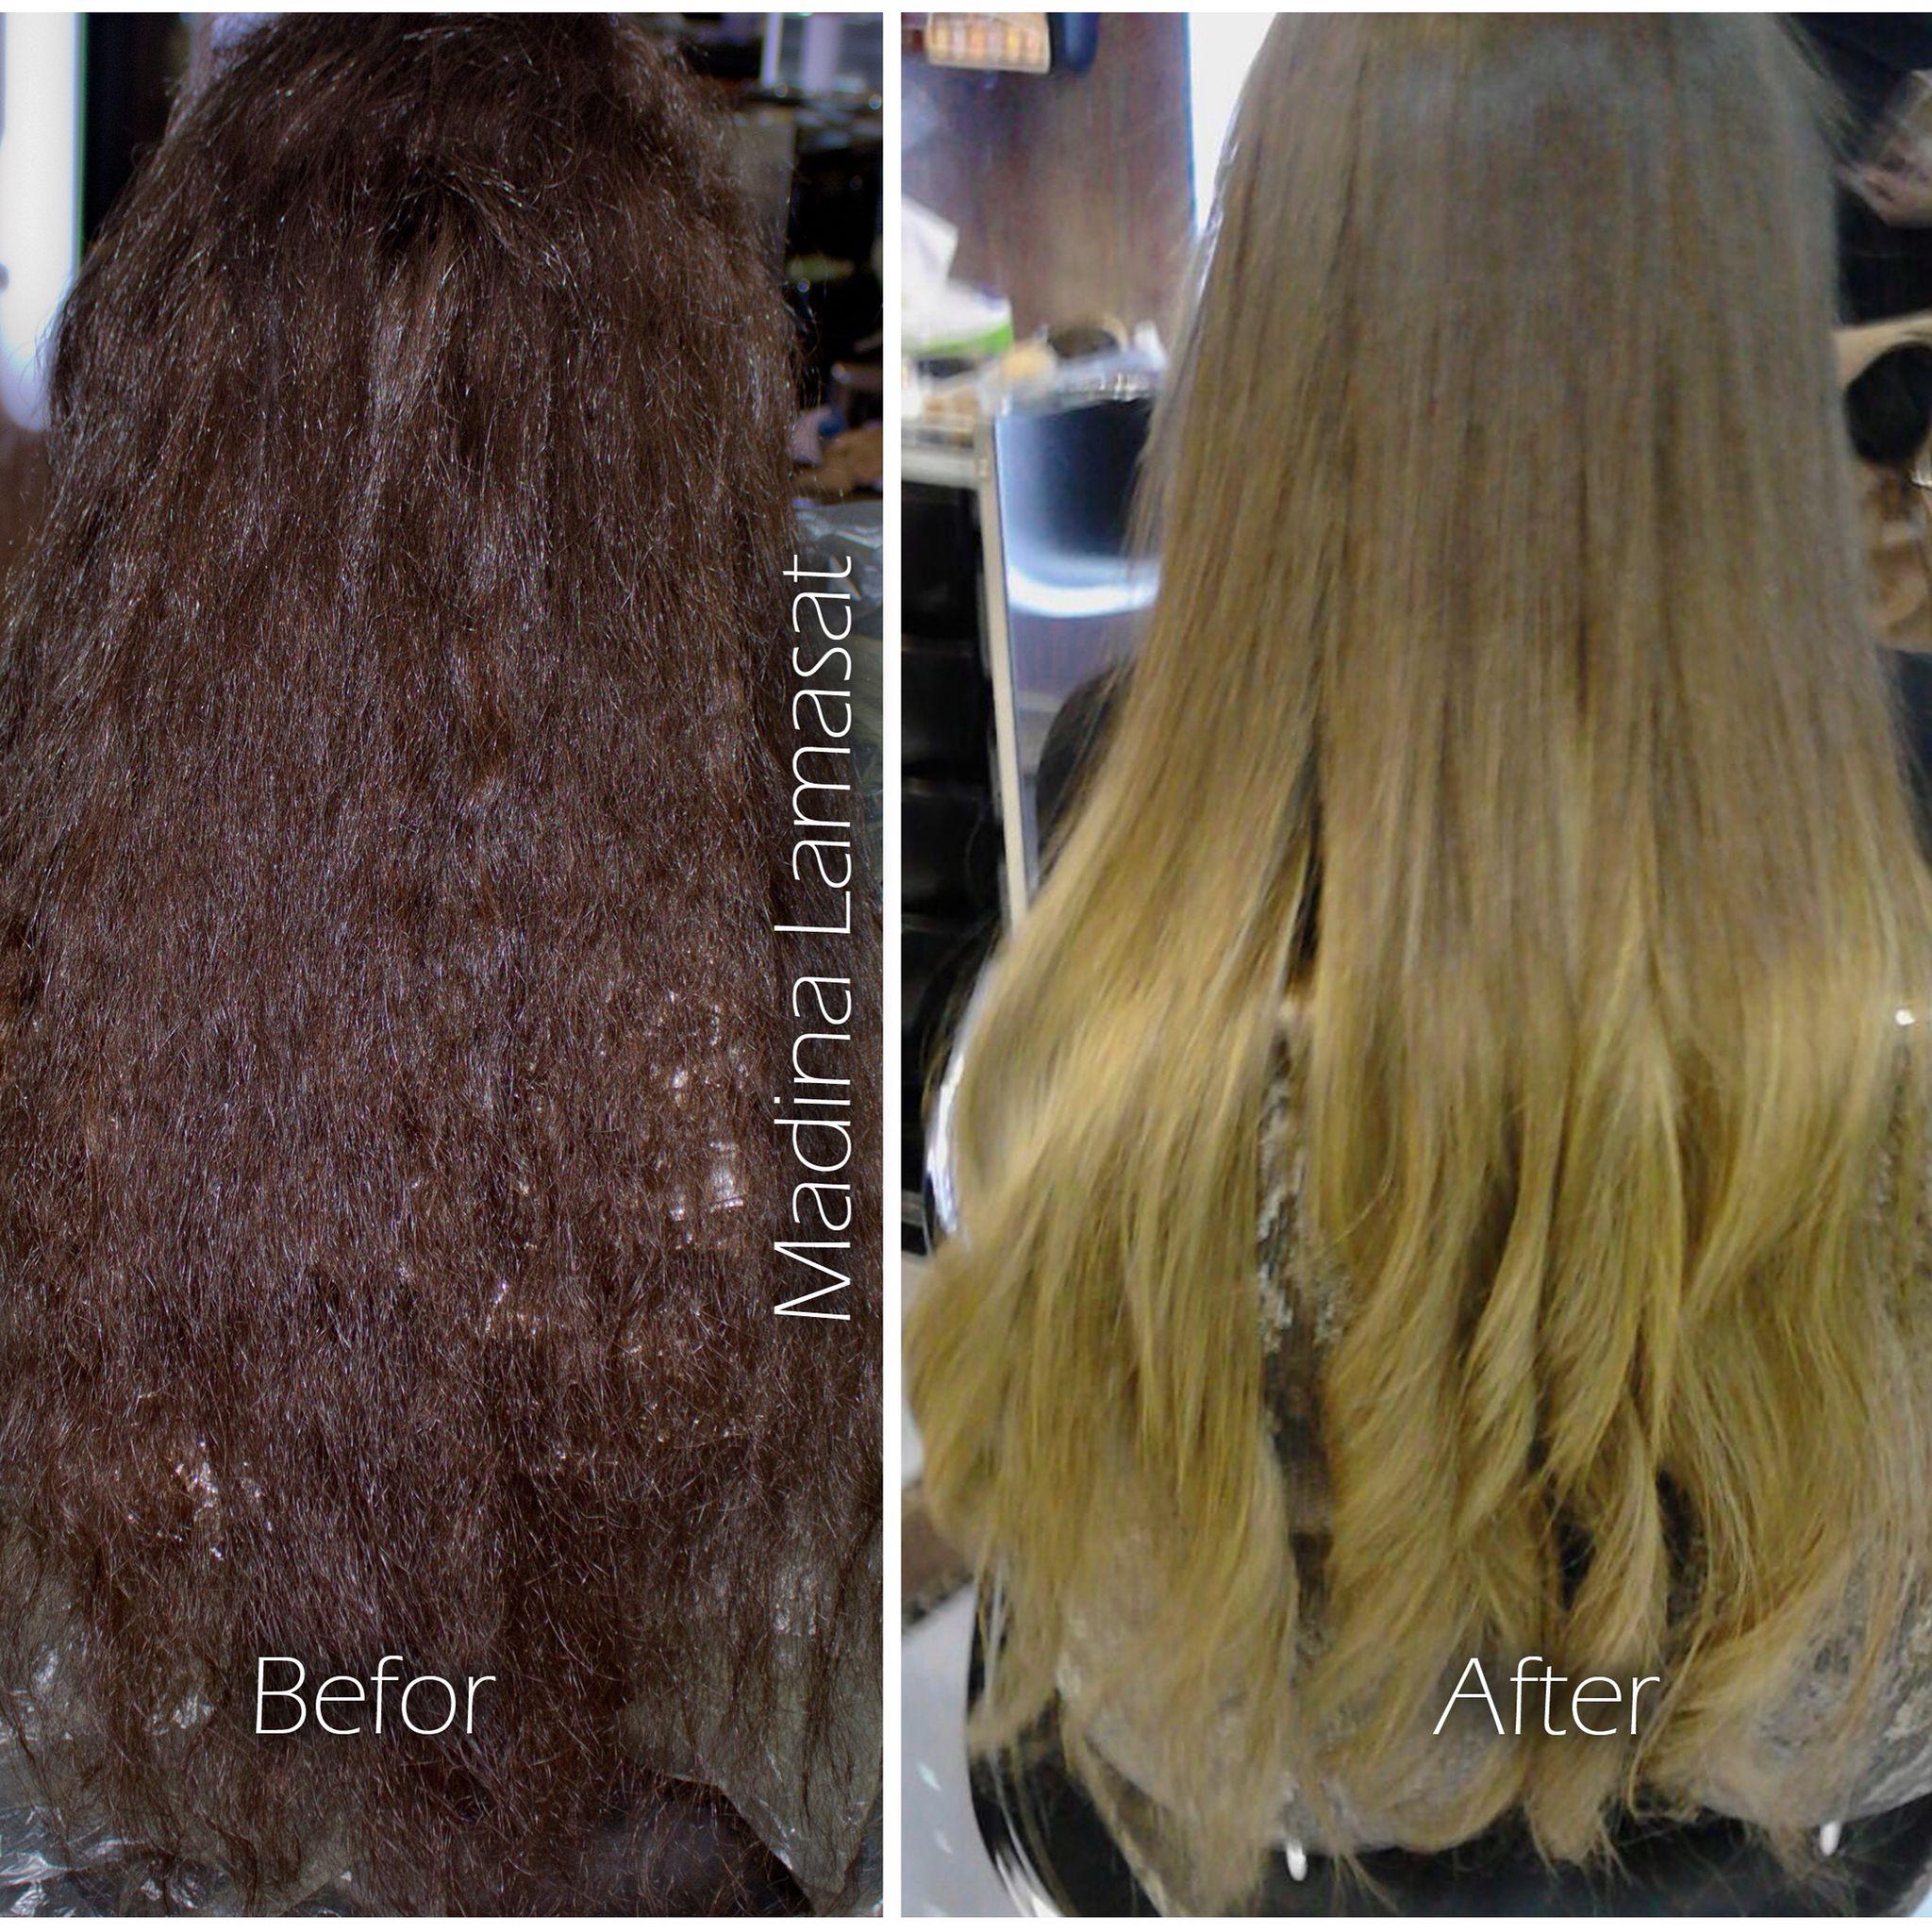 Hair Coloration By Madina Saleh Lamasat Beauty Center المختصة مدينة صالح اومبري لمسات جدة فرع الخالدية لمسات بيوتي سنت Hair Styles Long Hair Styles Beauty